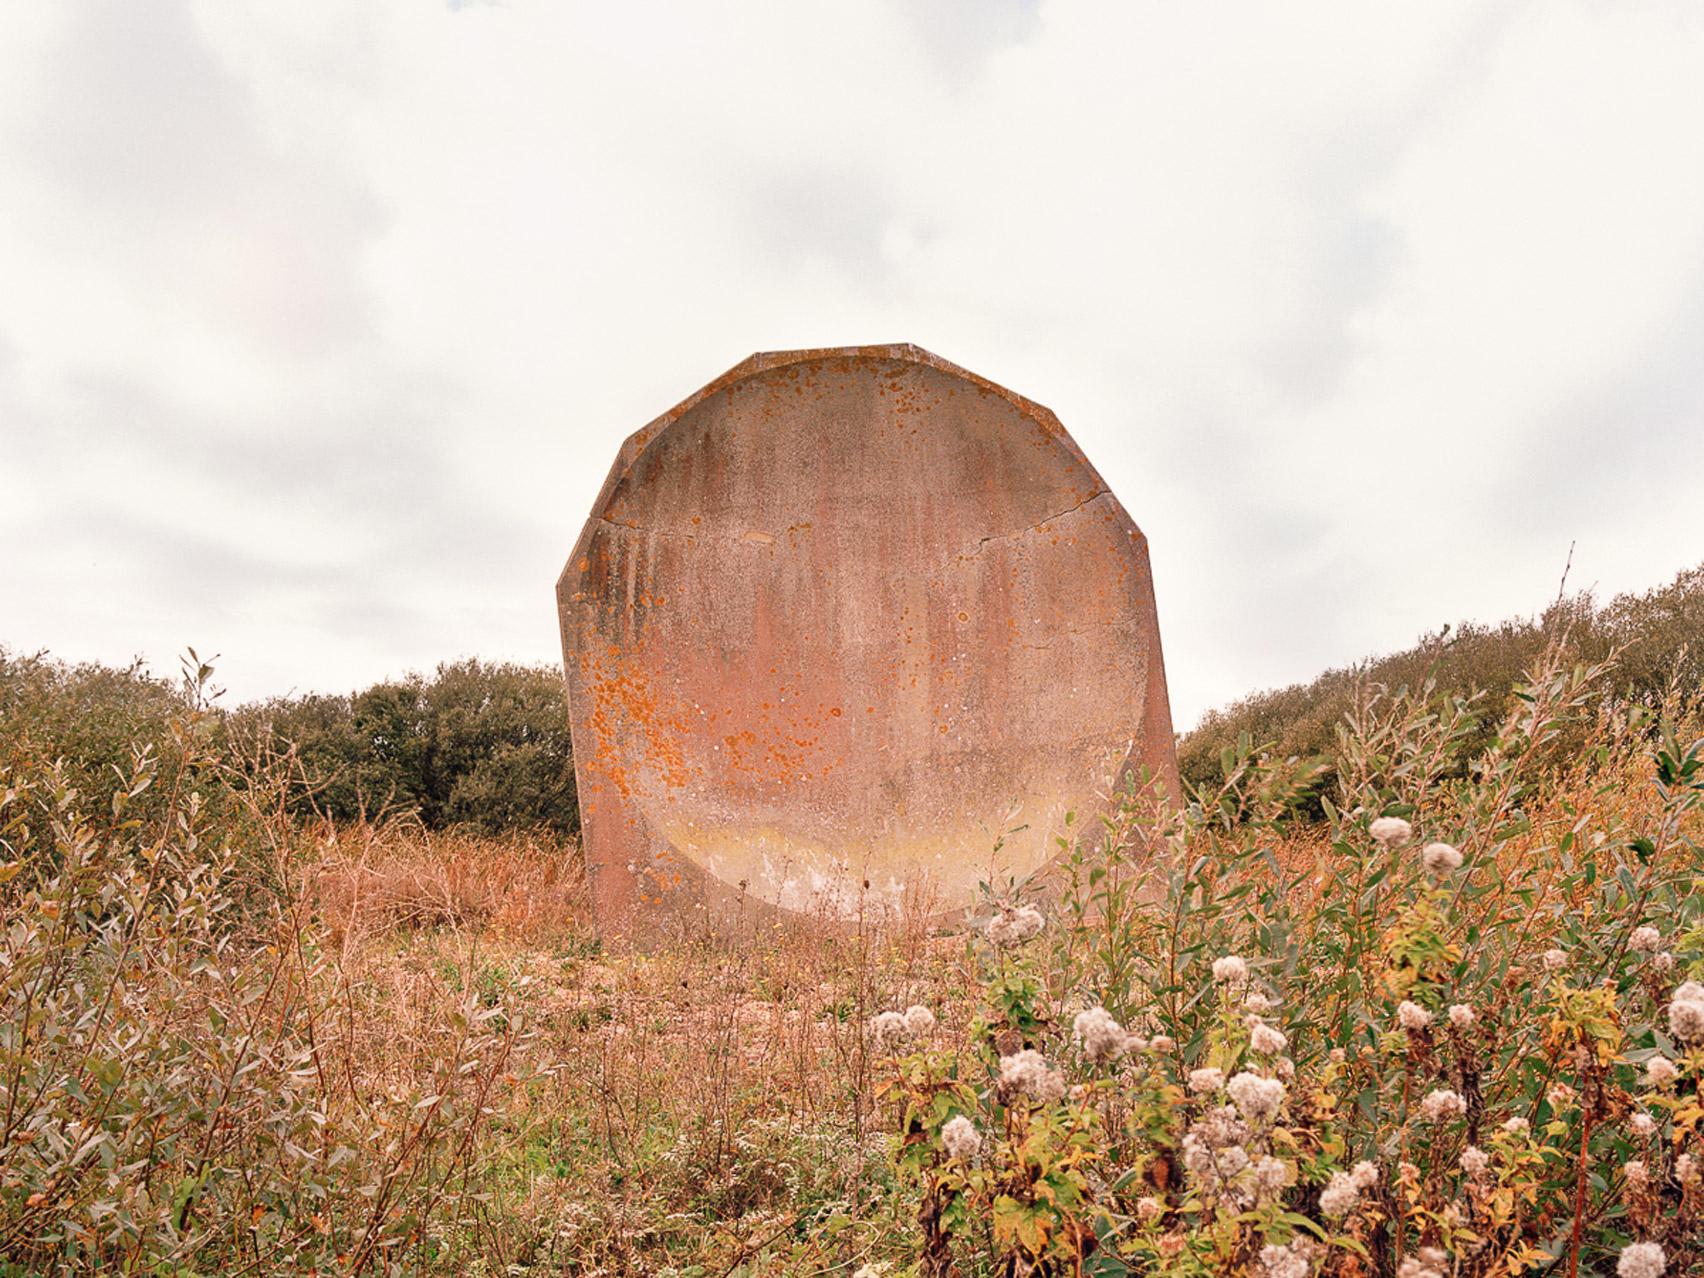 Sound Mirror by Piercarlo Quecchia